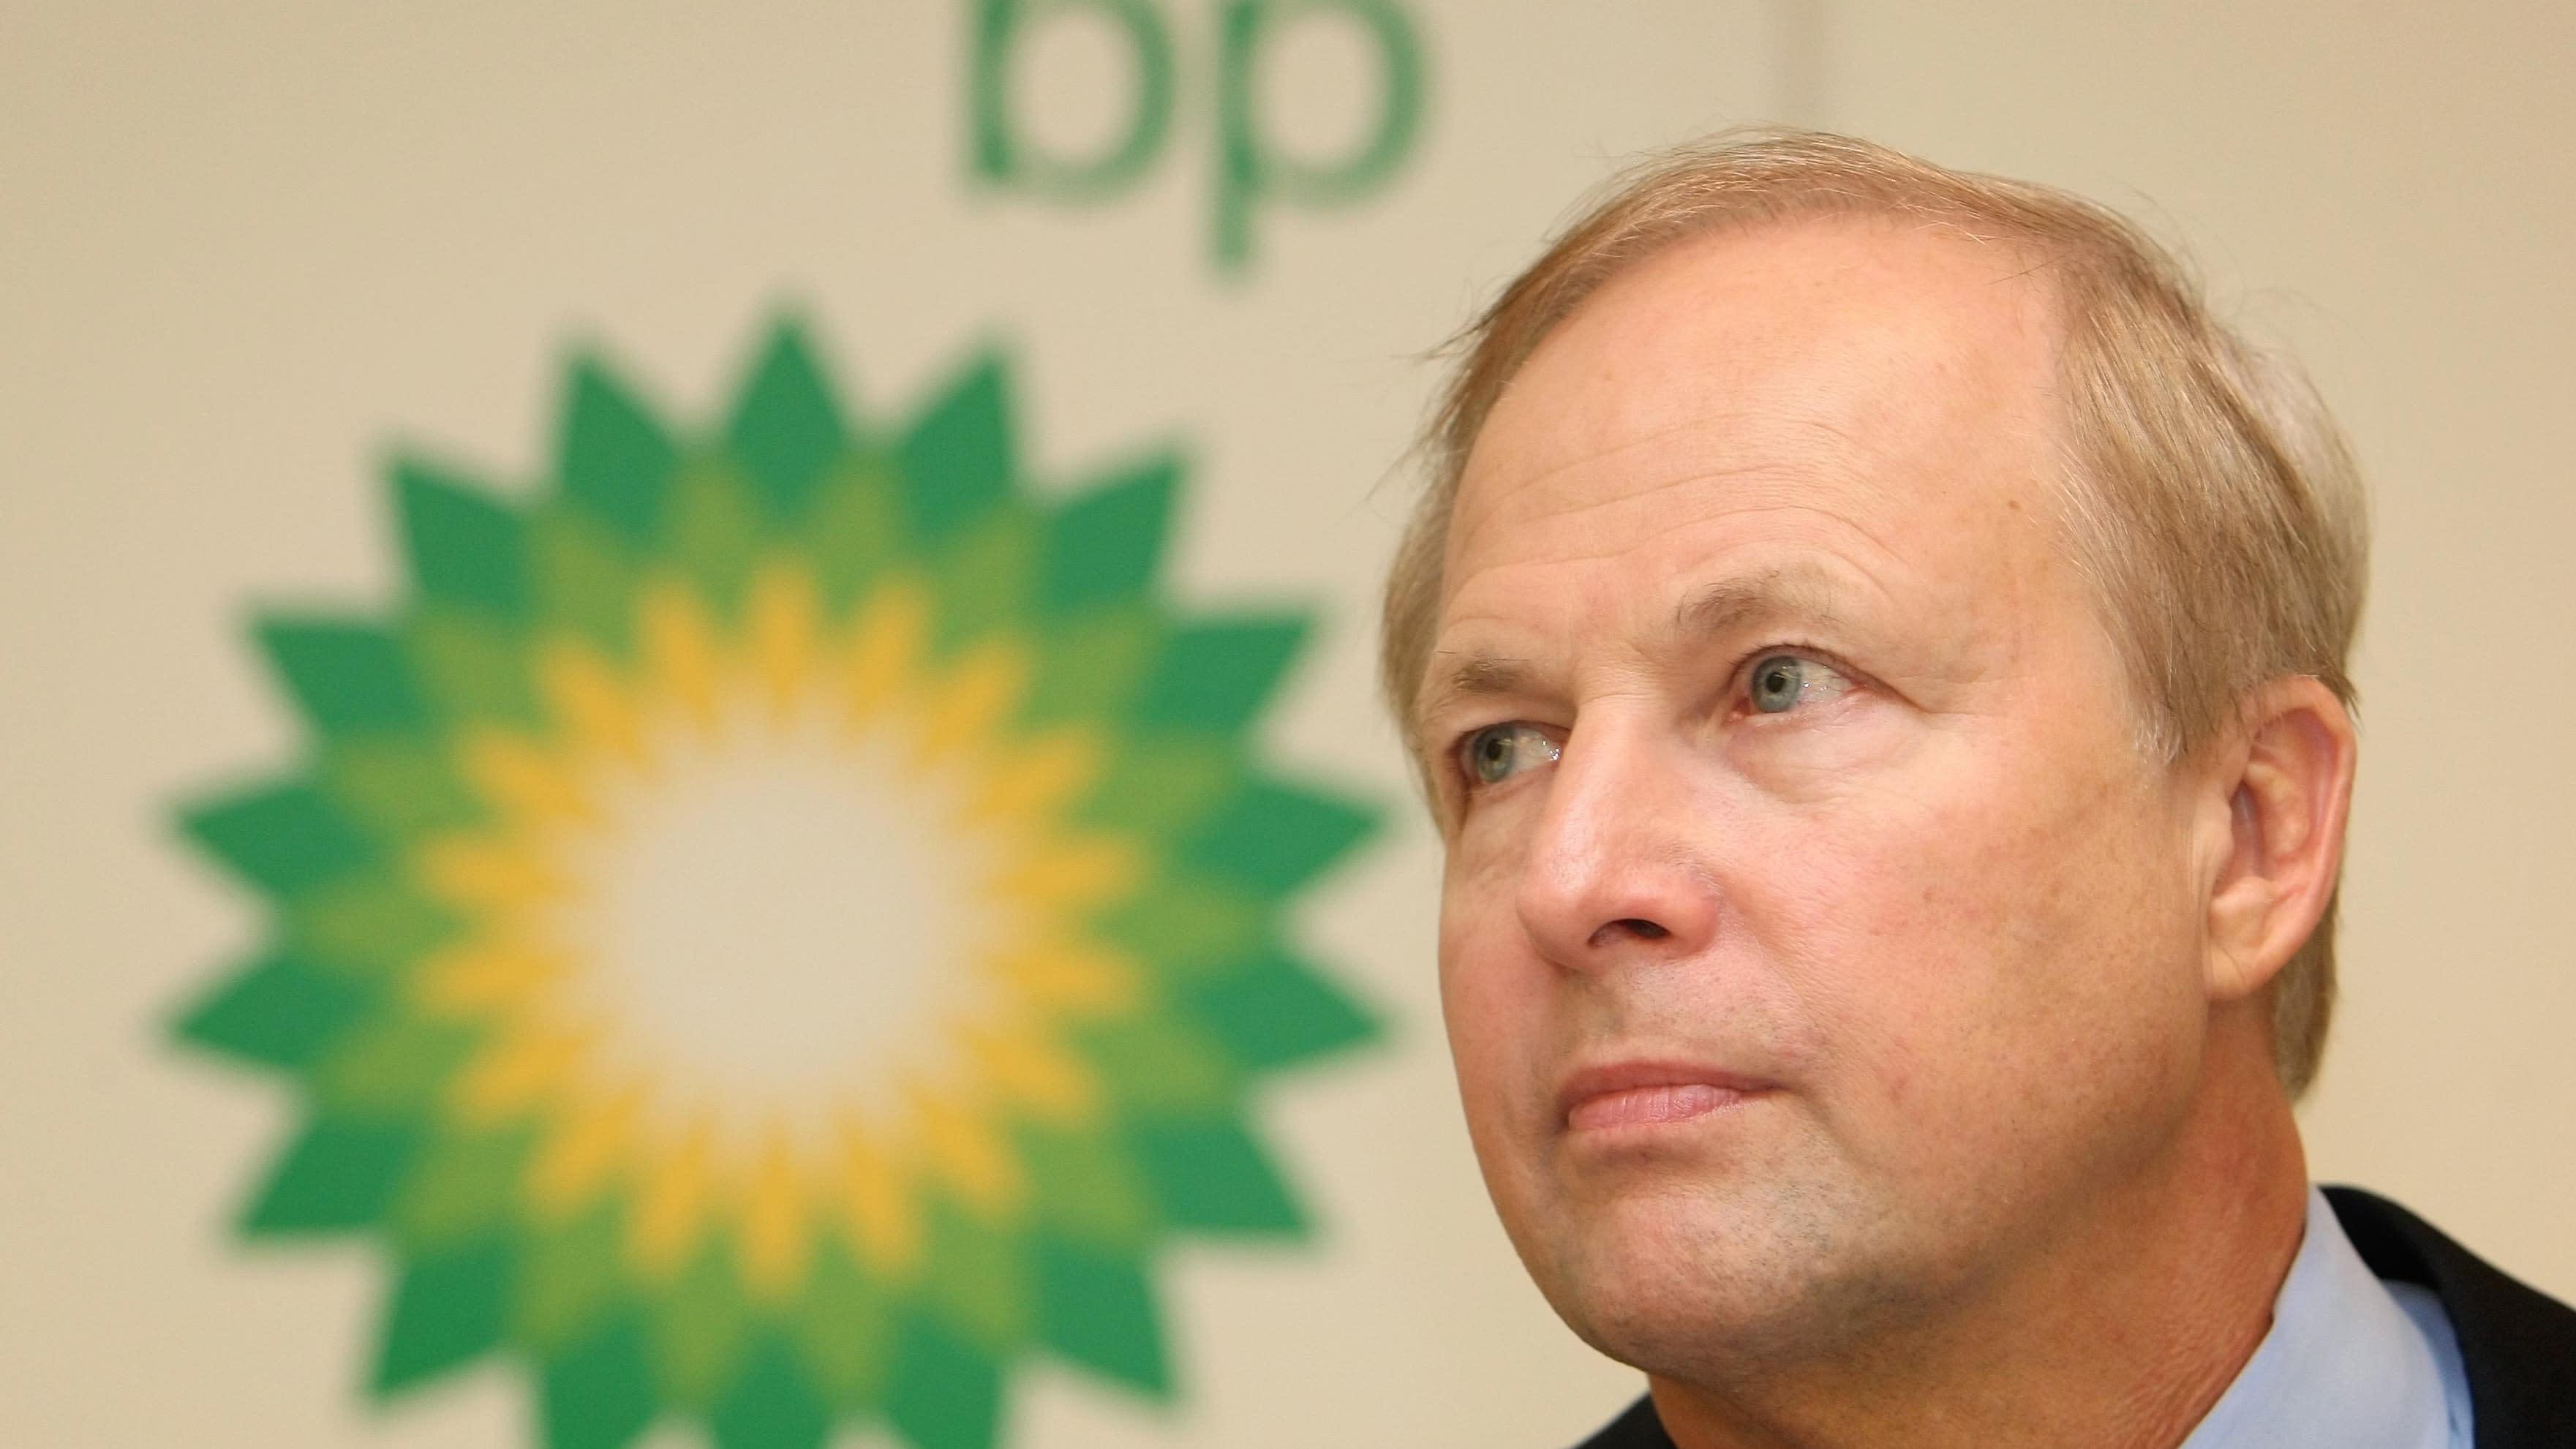 BP chief executive Bob Dudley retires